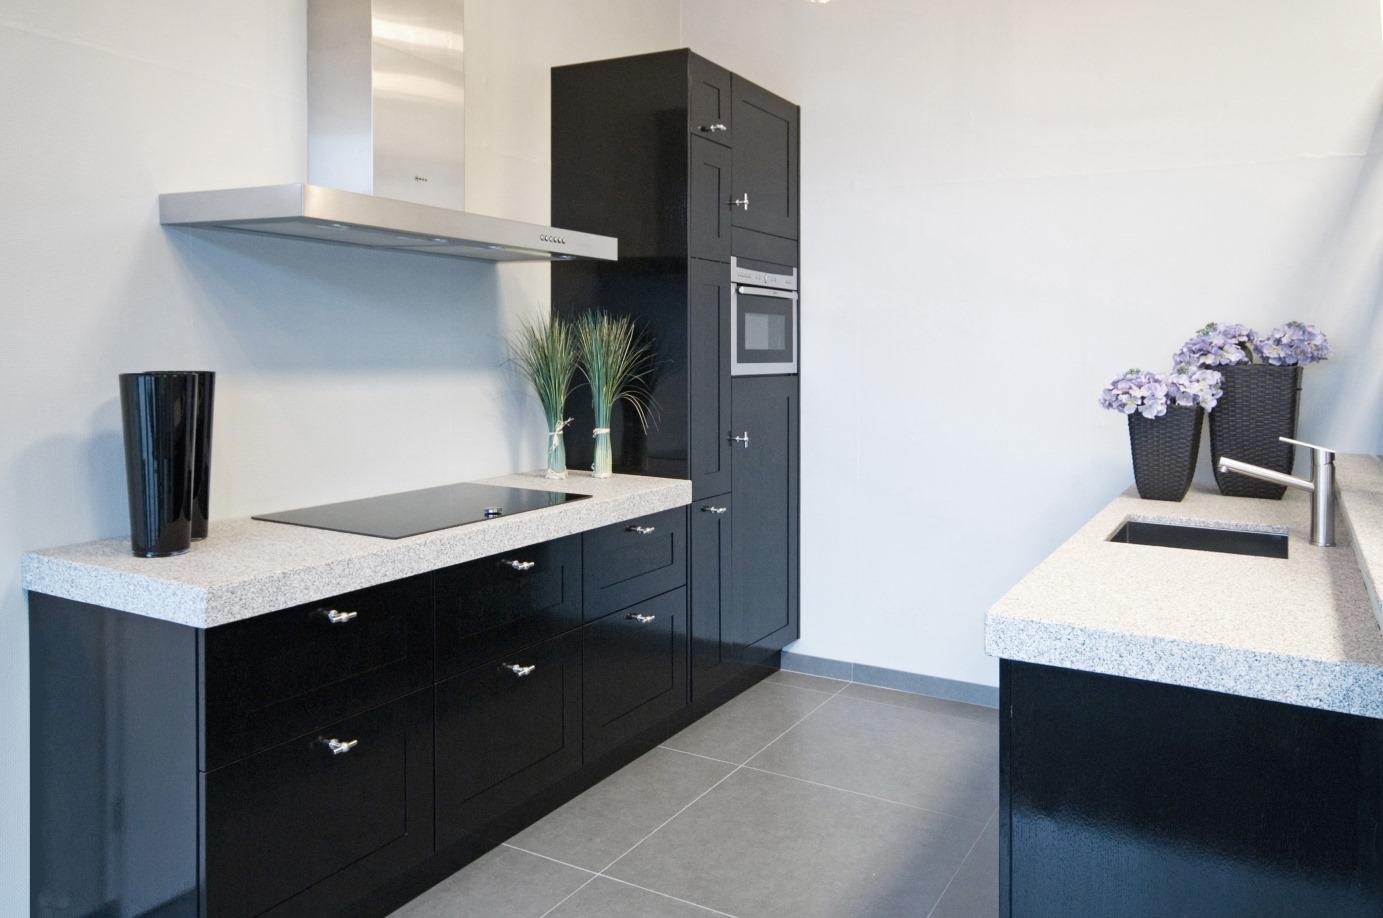 Vaak Zwarte keukens in diverse stijlen en prijsklassen. - Pelma JO67